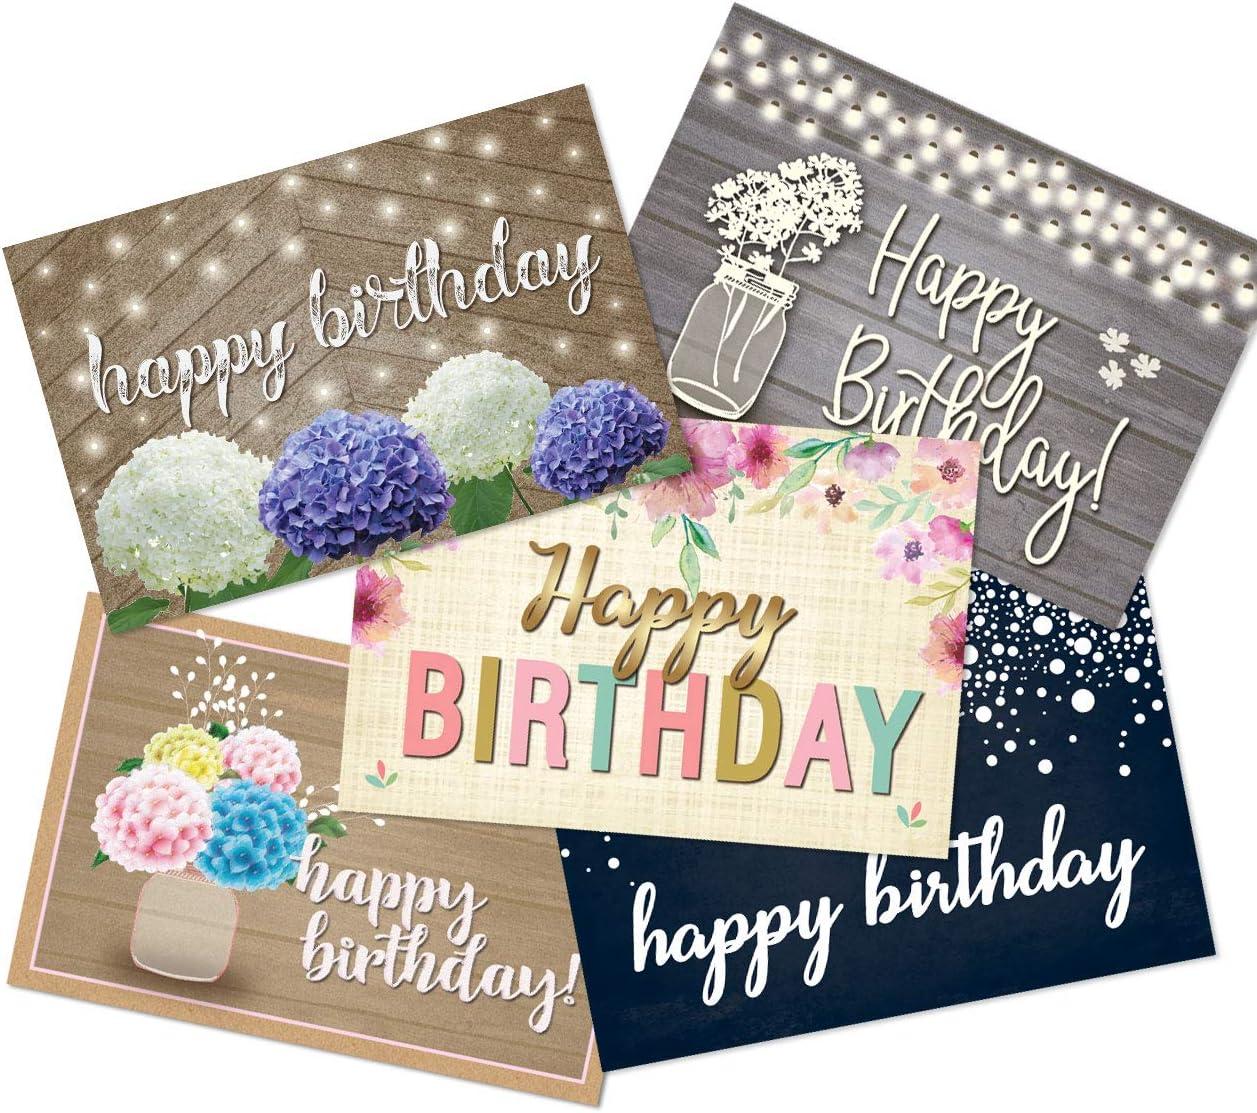 50 Happy Birthday Postcards - 5 Birthday Designs - 4